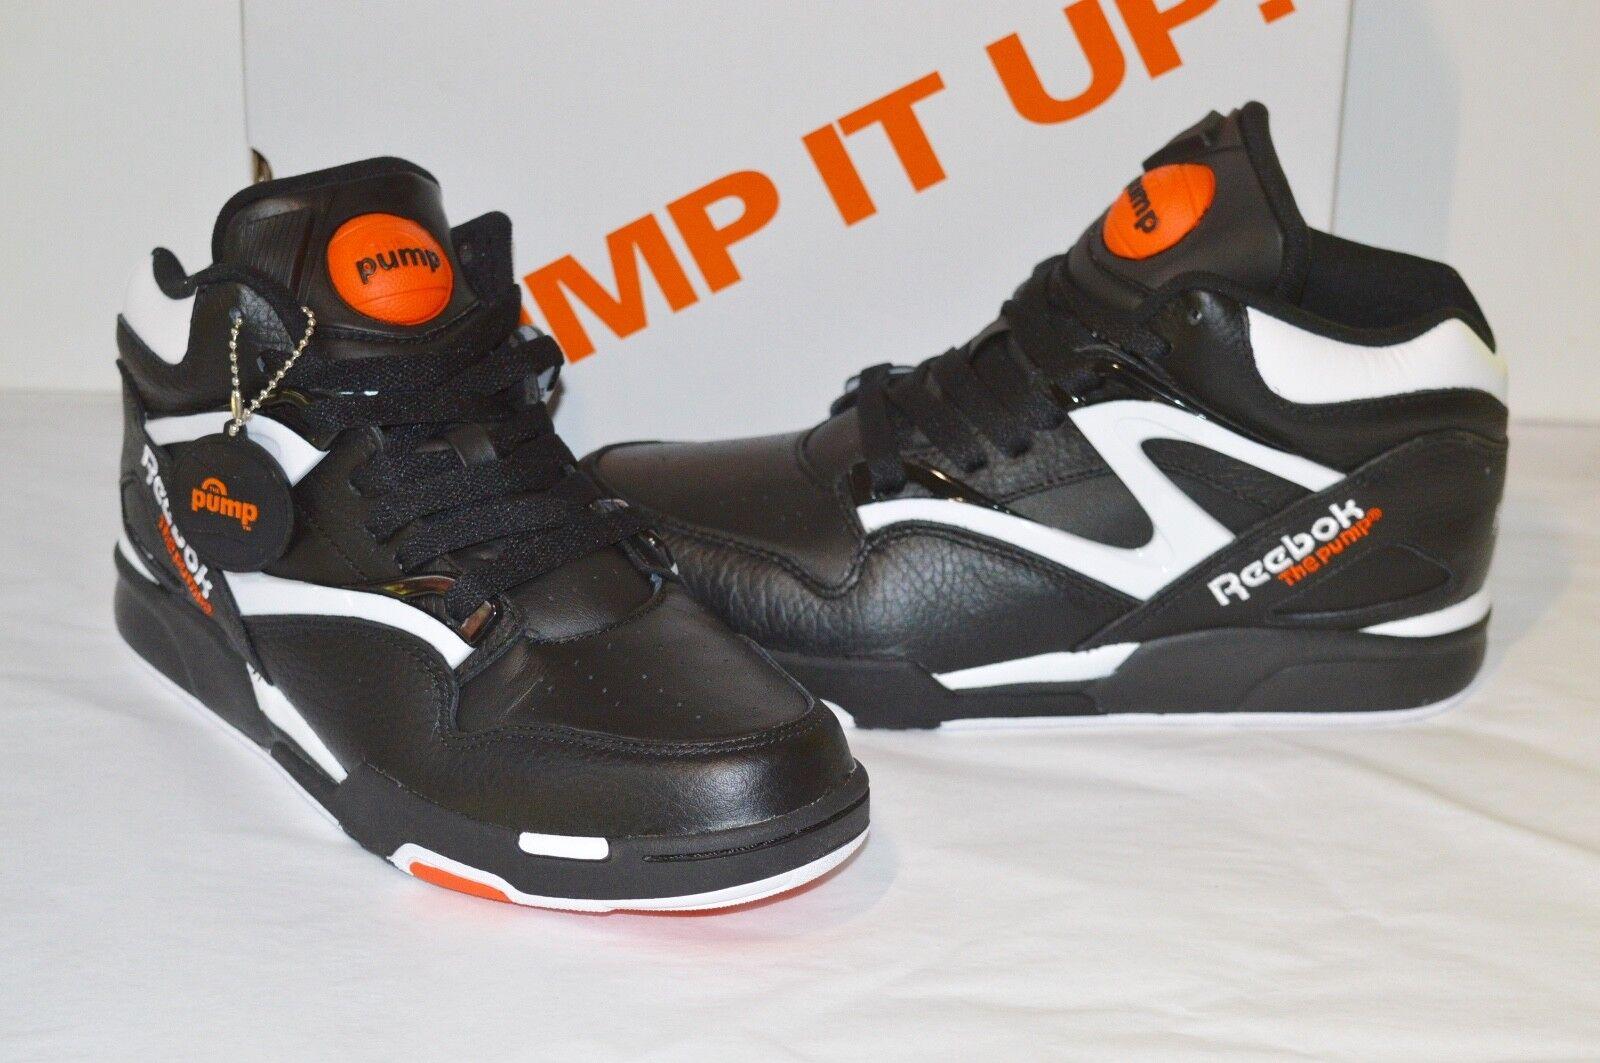 8e34dced17f Reebok Pump Omni Lite SNEAKERS Dee Brown Black White Varsity Orange ...